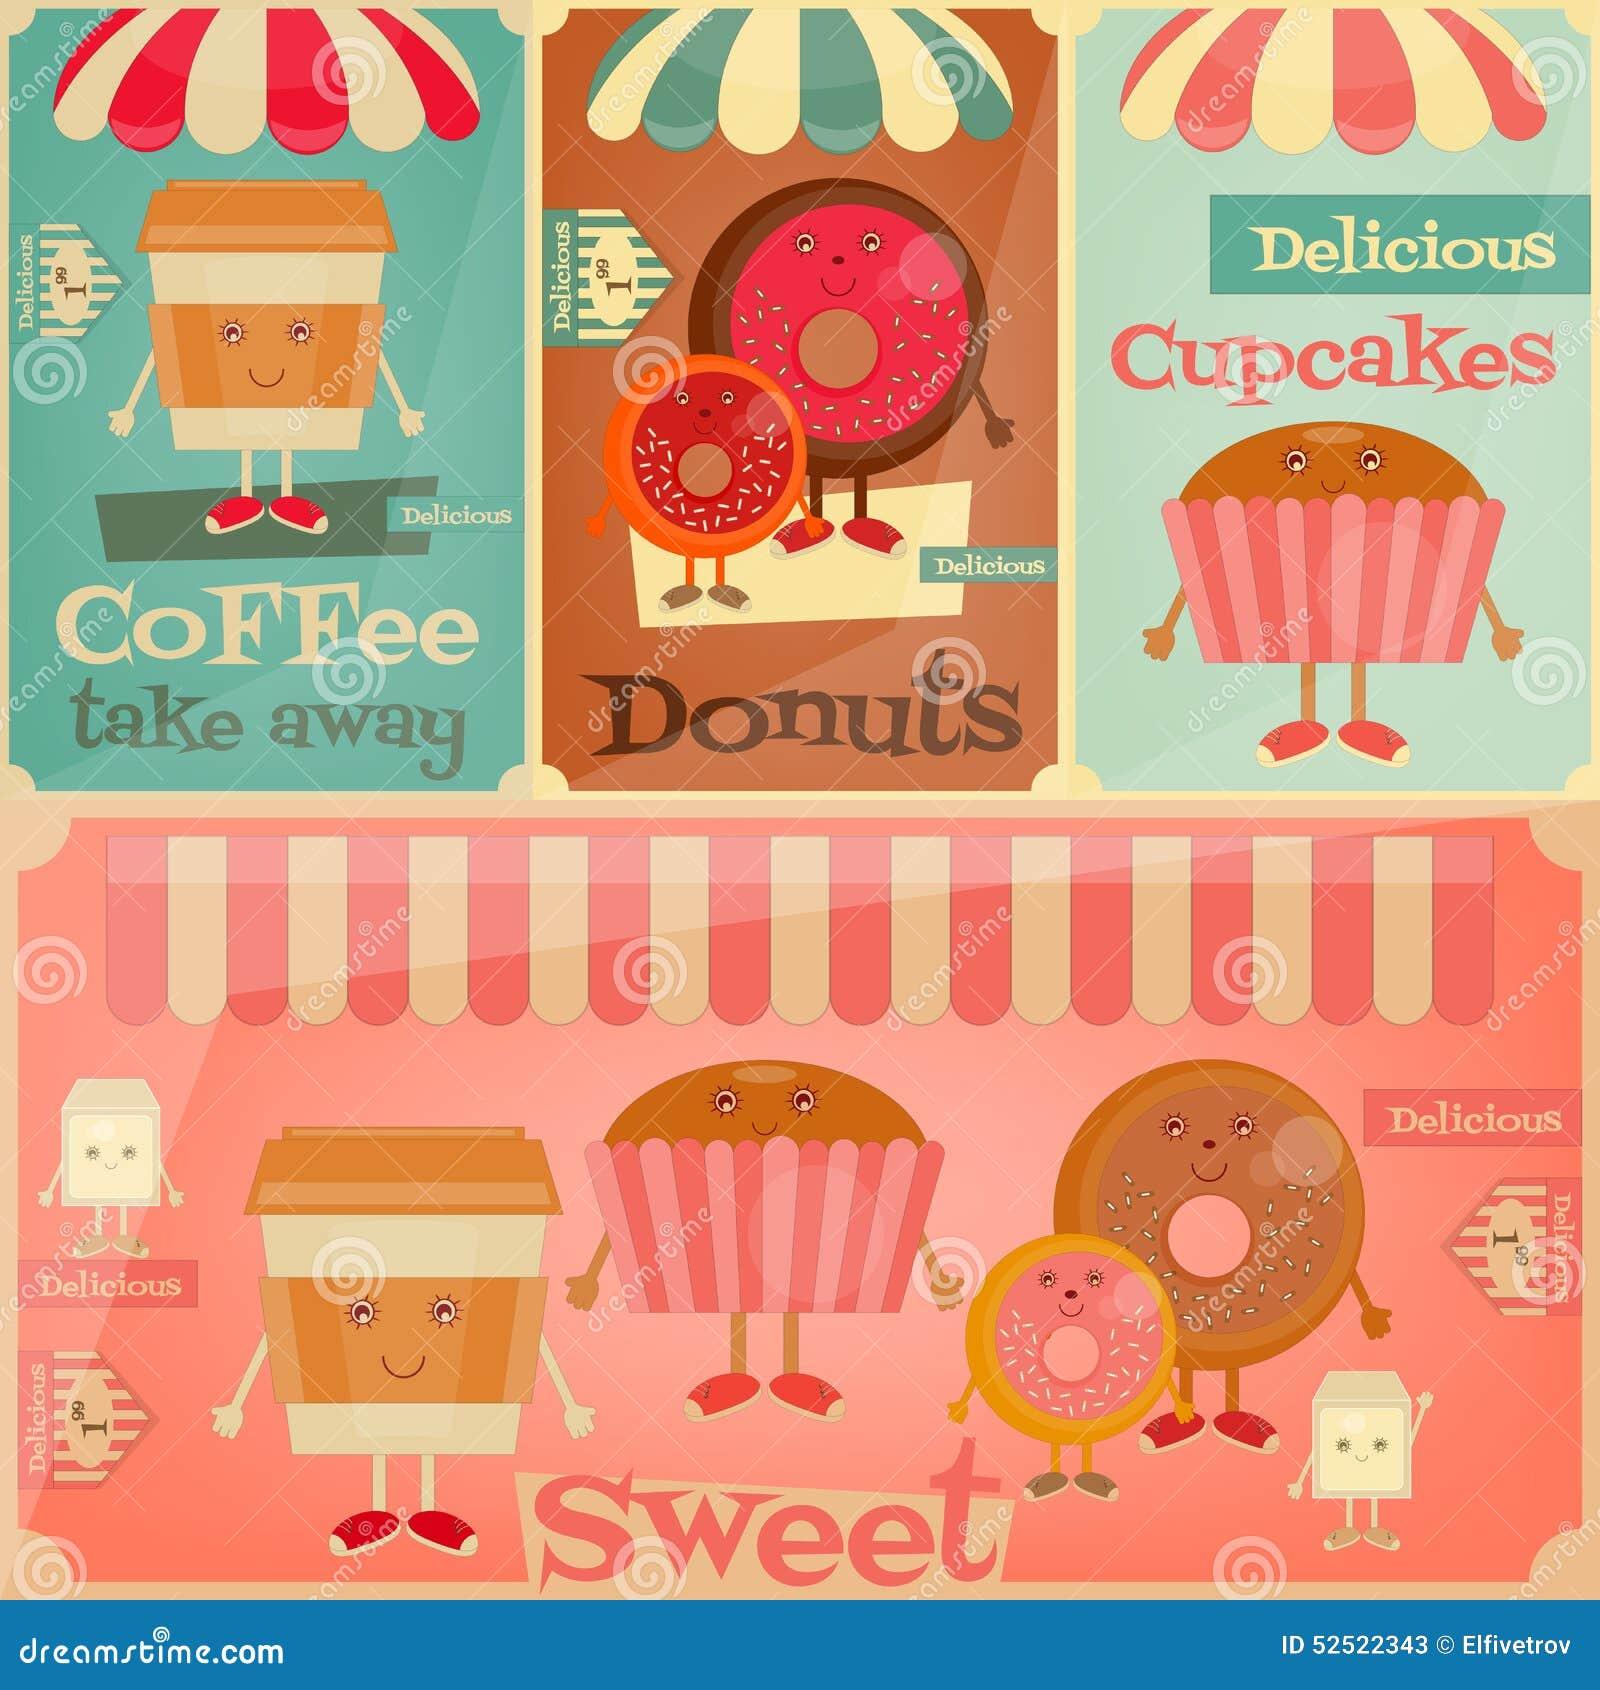 Japanese Coffee Mugs Cafe Sweet Shop Stock Vector Image 52522343